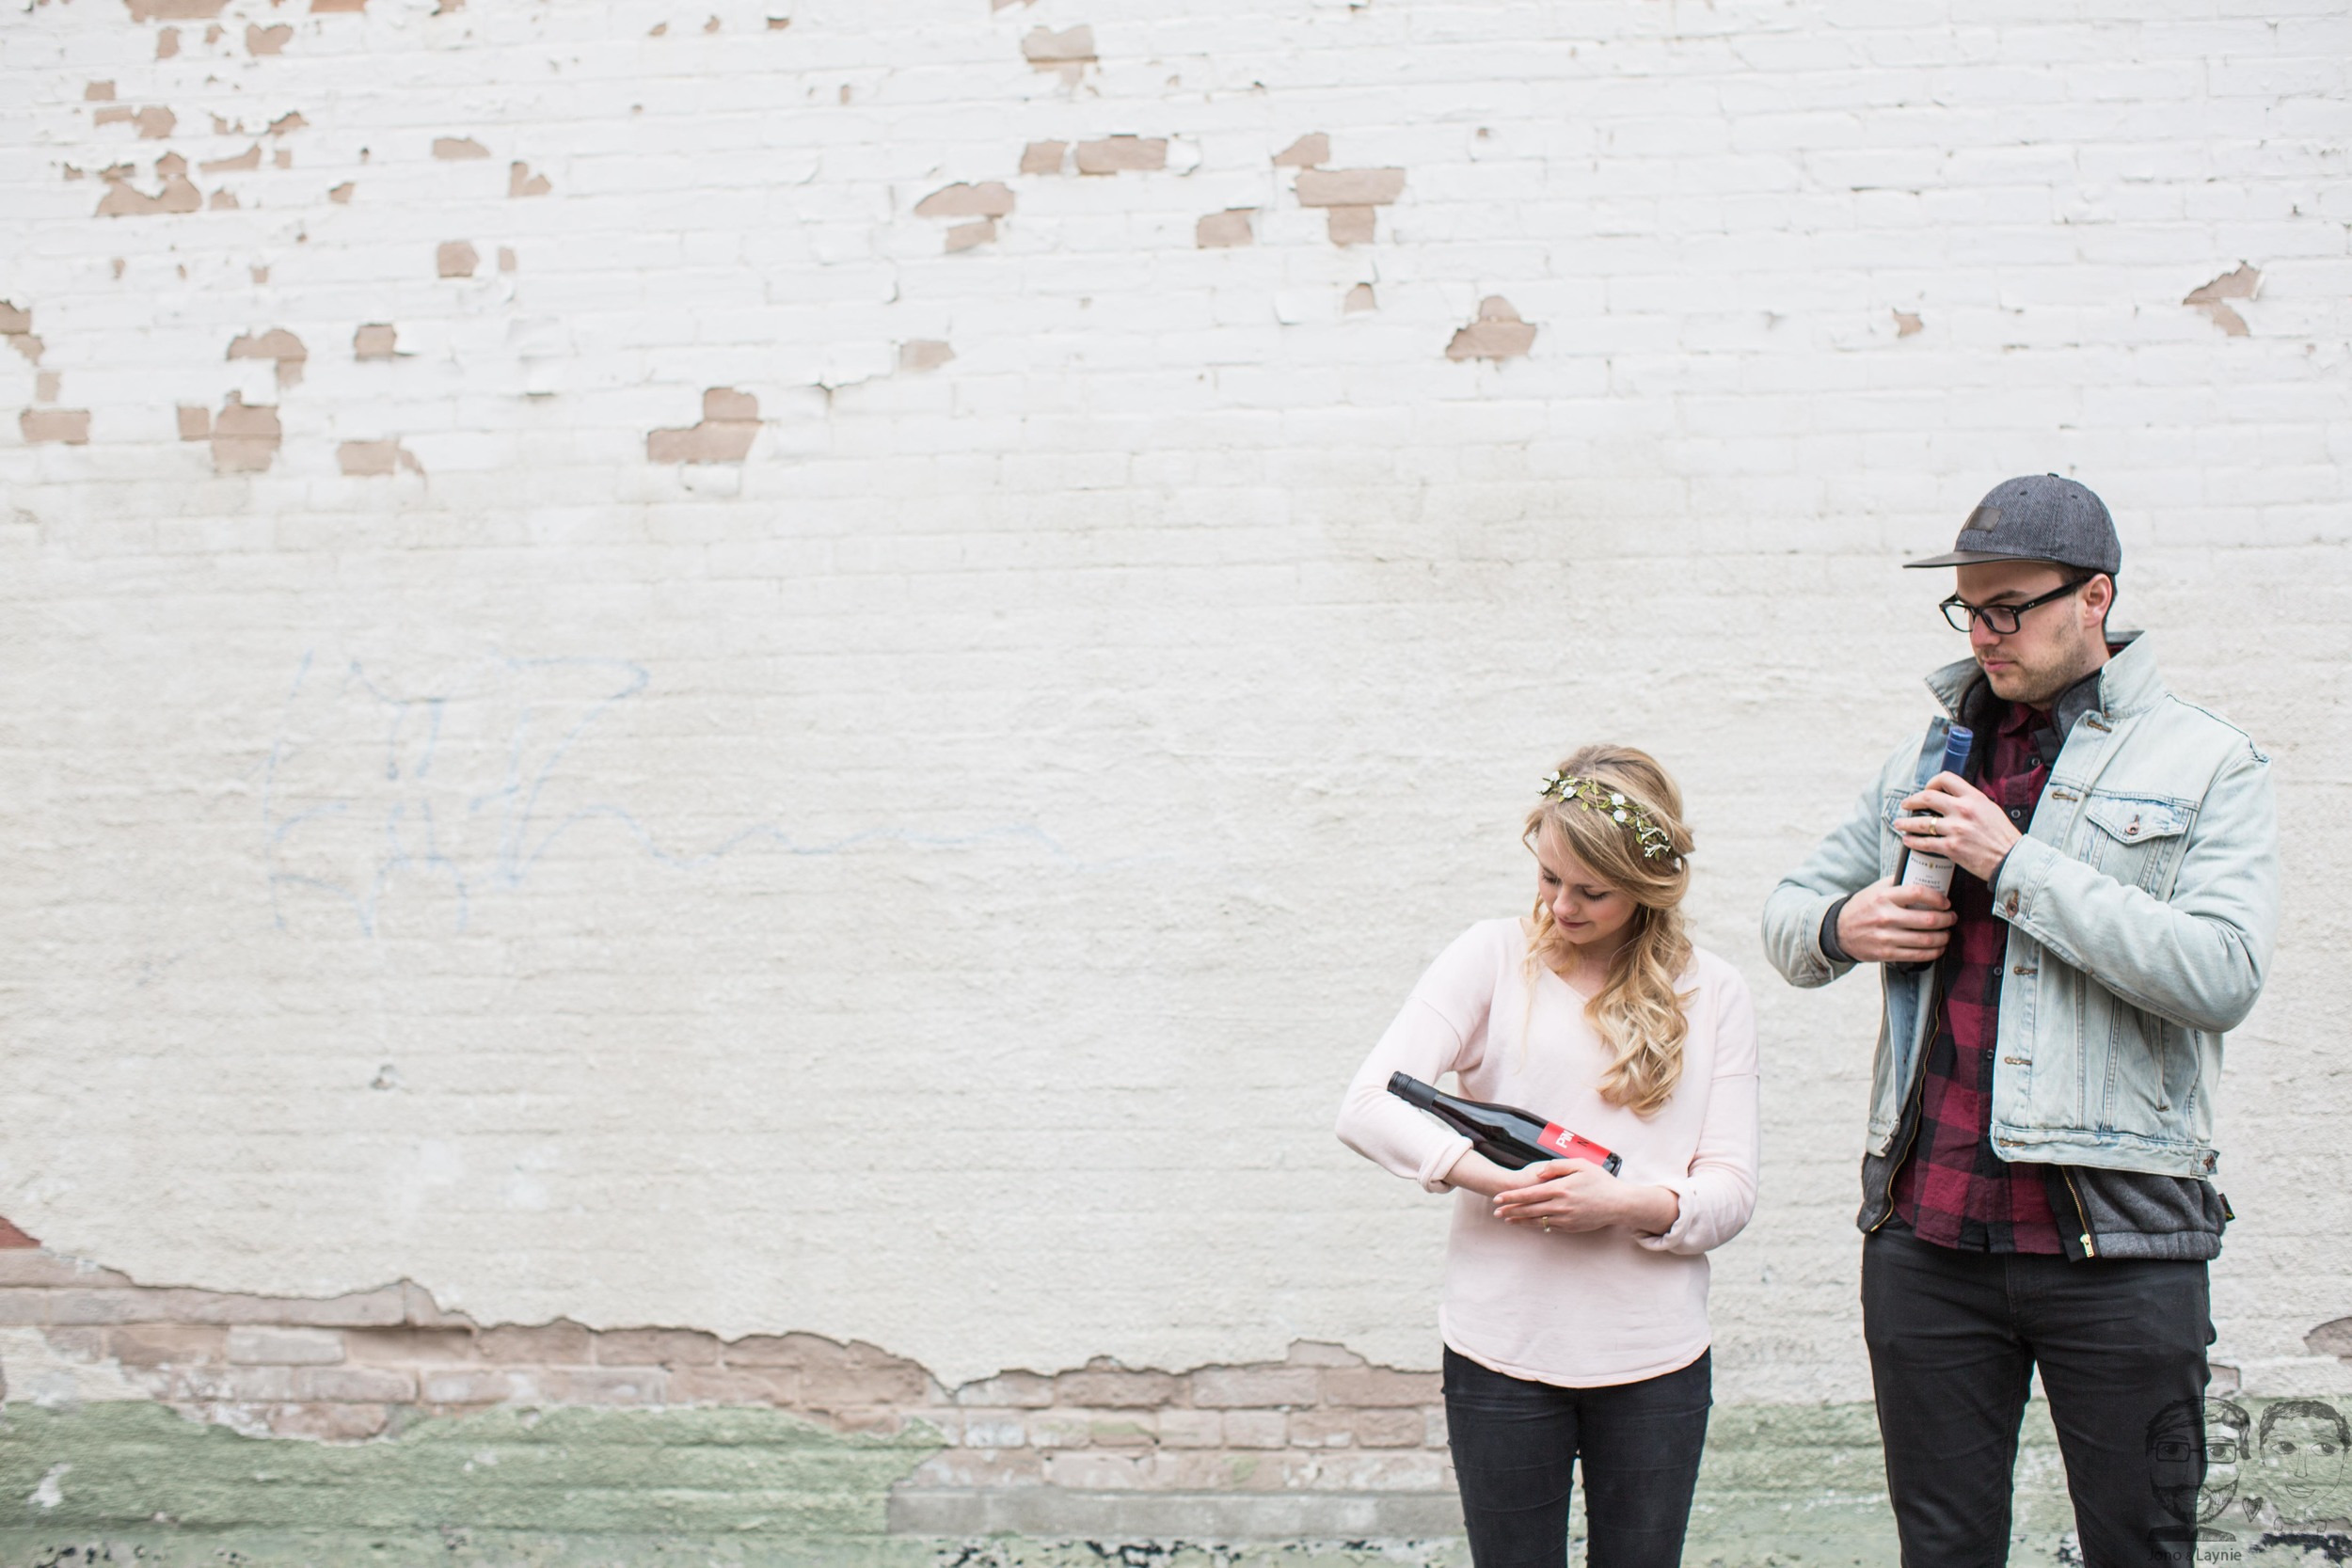 02Jono & Laynie Co.-Toronto Lifestyle & Wedding Photographers.jpg